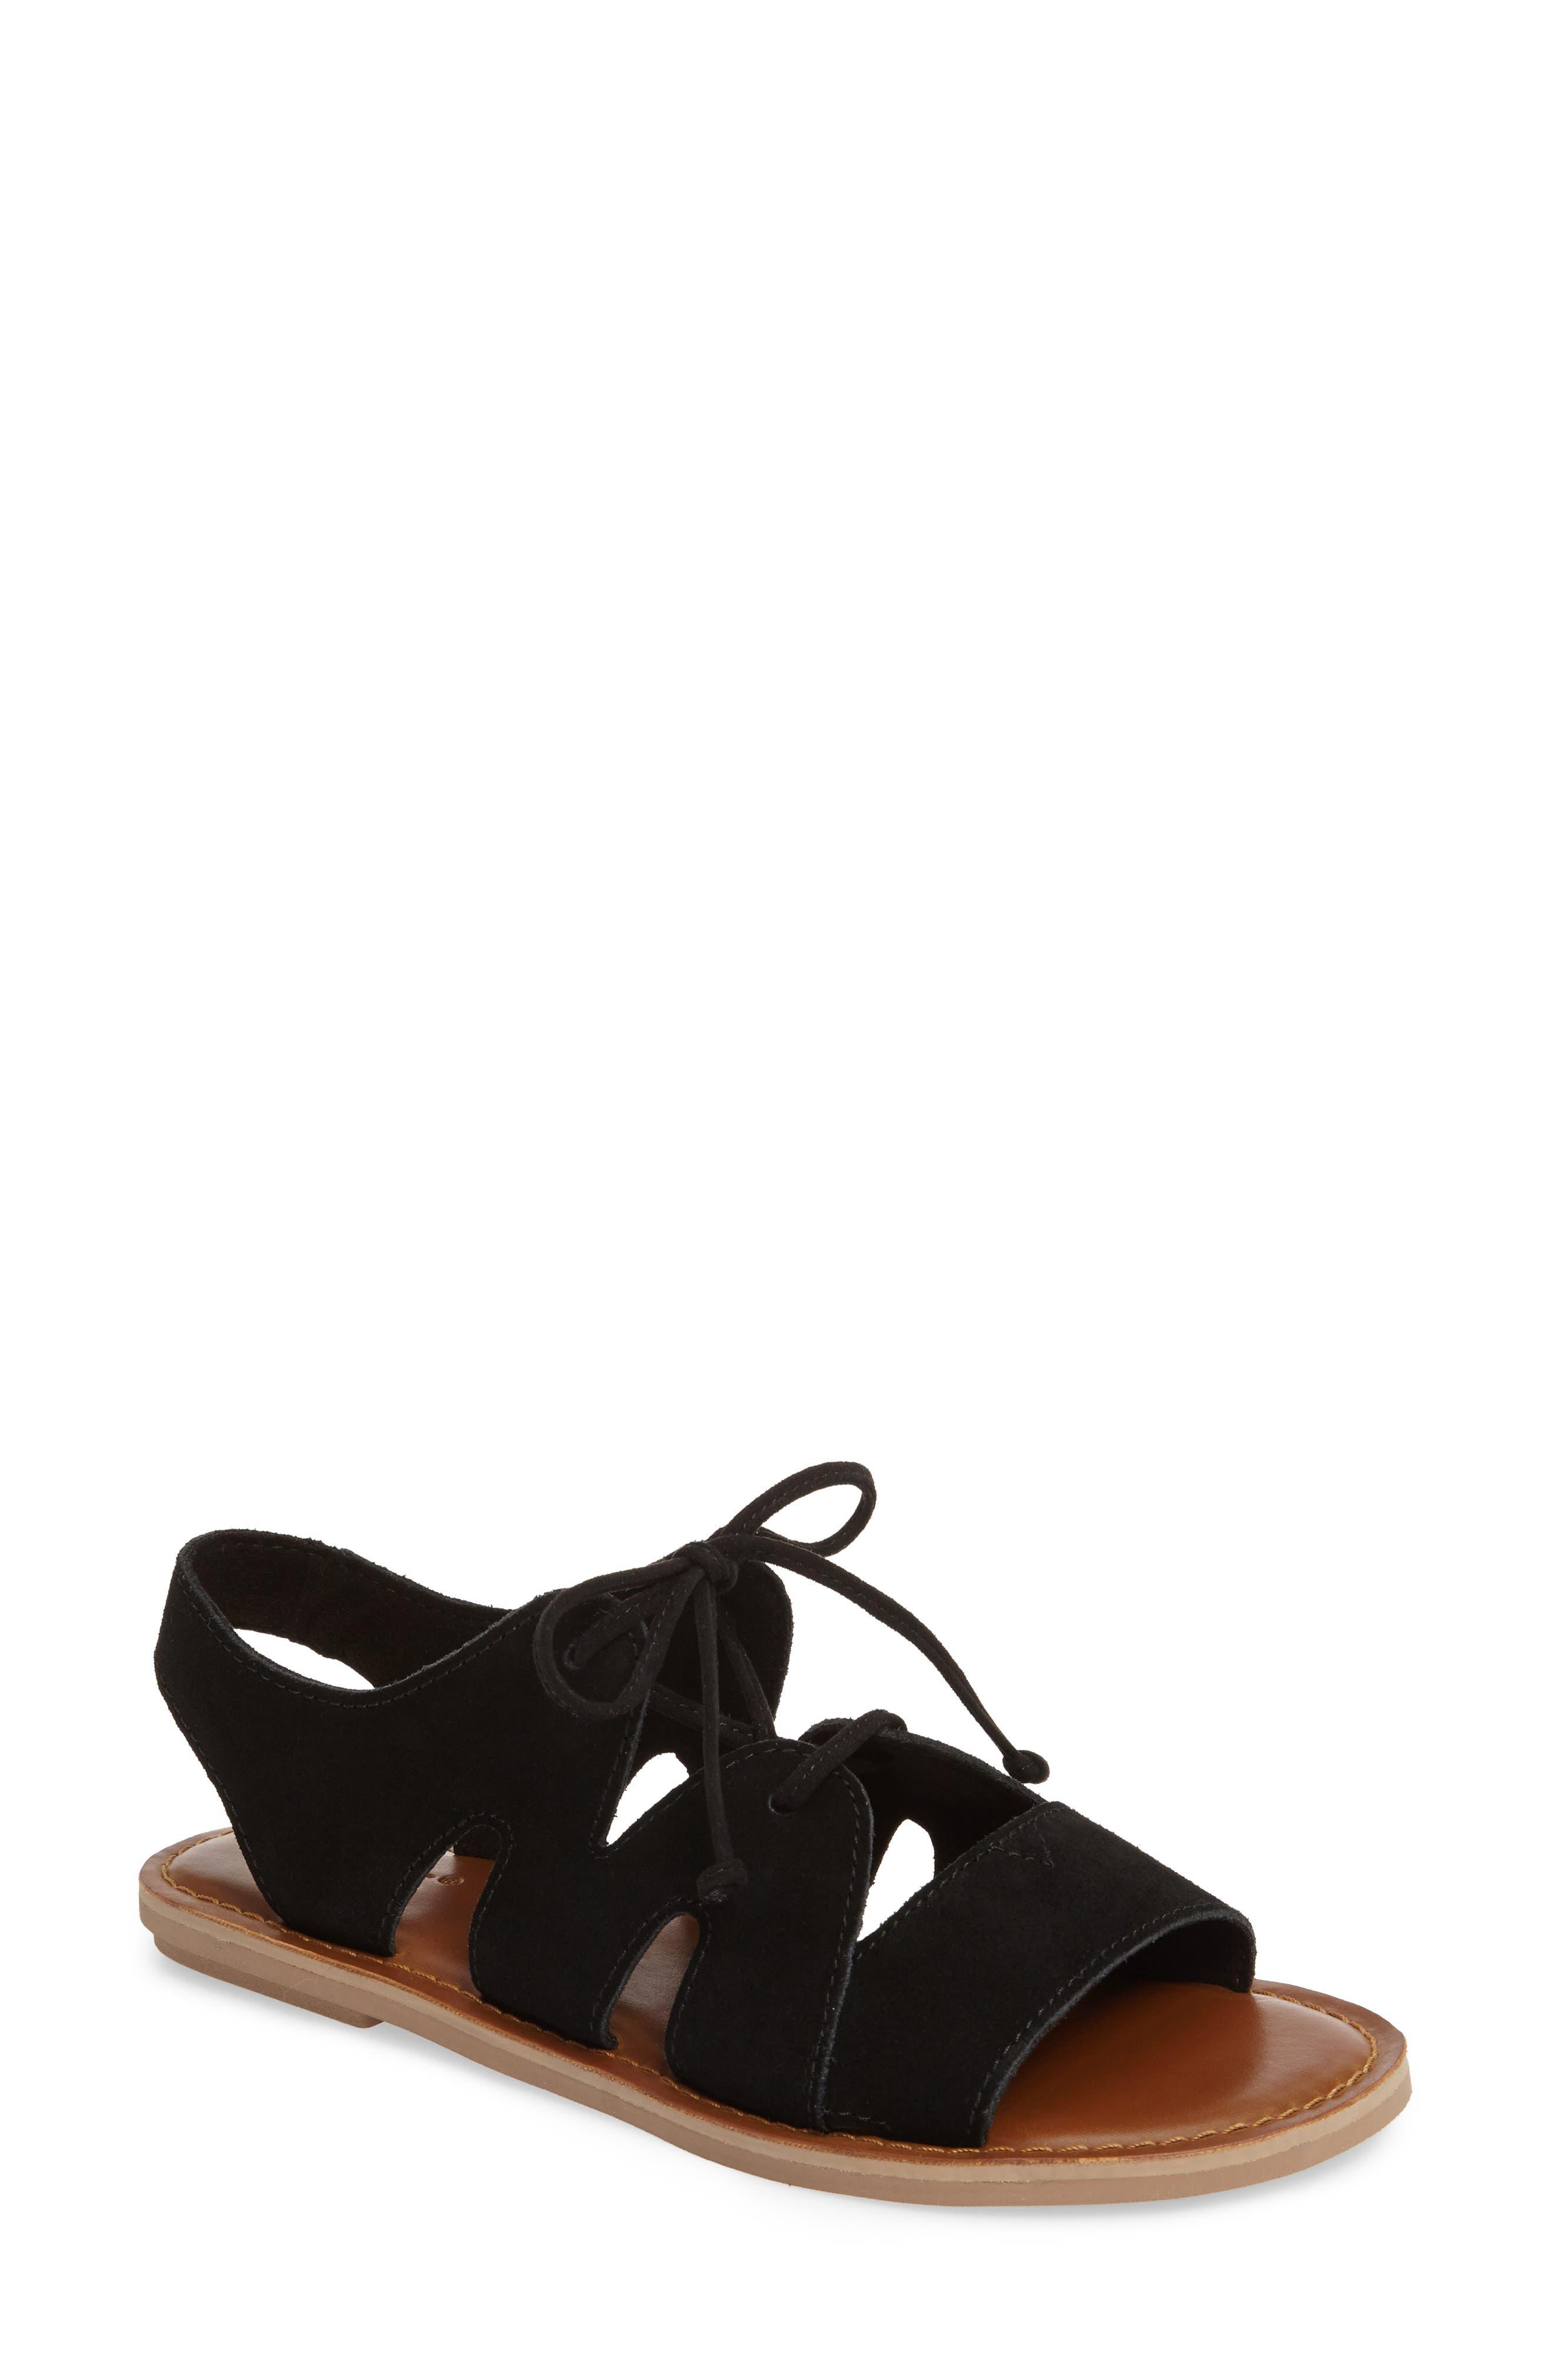 Calips Sandal,                         Main,                         color, 001